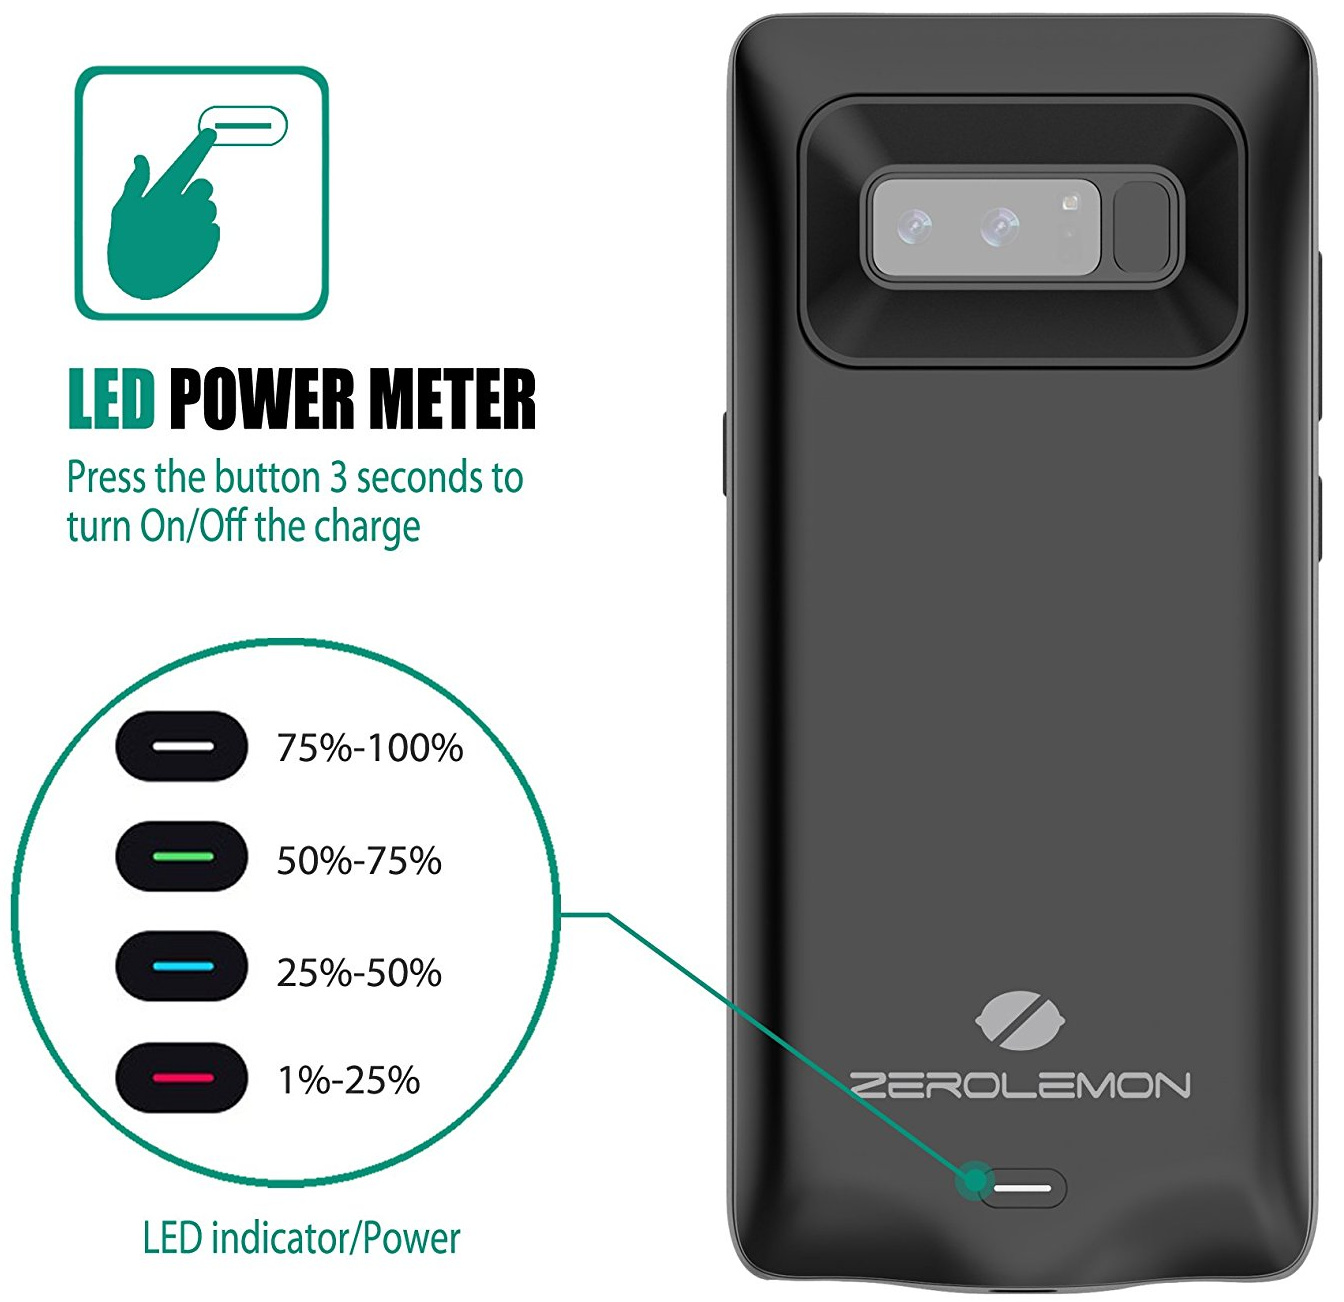 zerolemon note 8 battery case thick - حافظة لهاتف جالكسي نوت 8 تزيد سعة البطارية مرة ونصف تقريبا